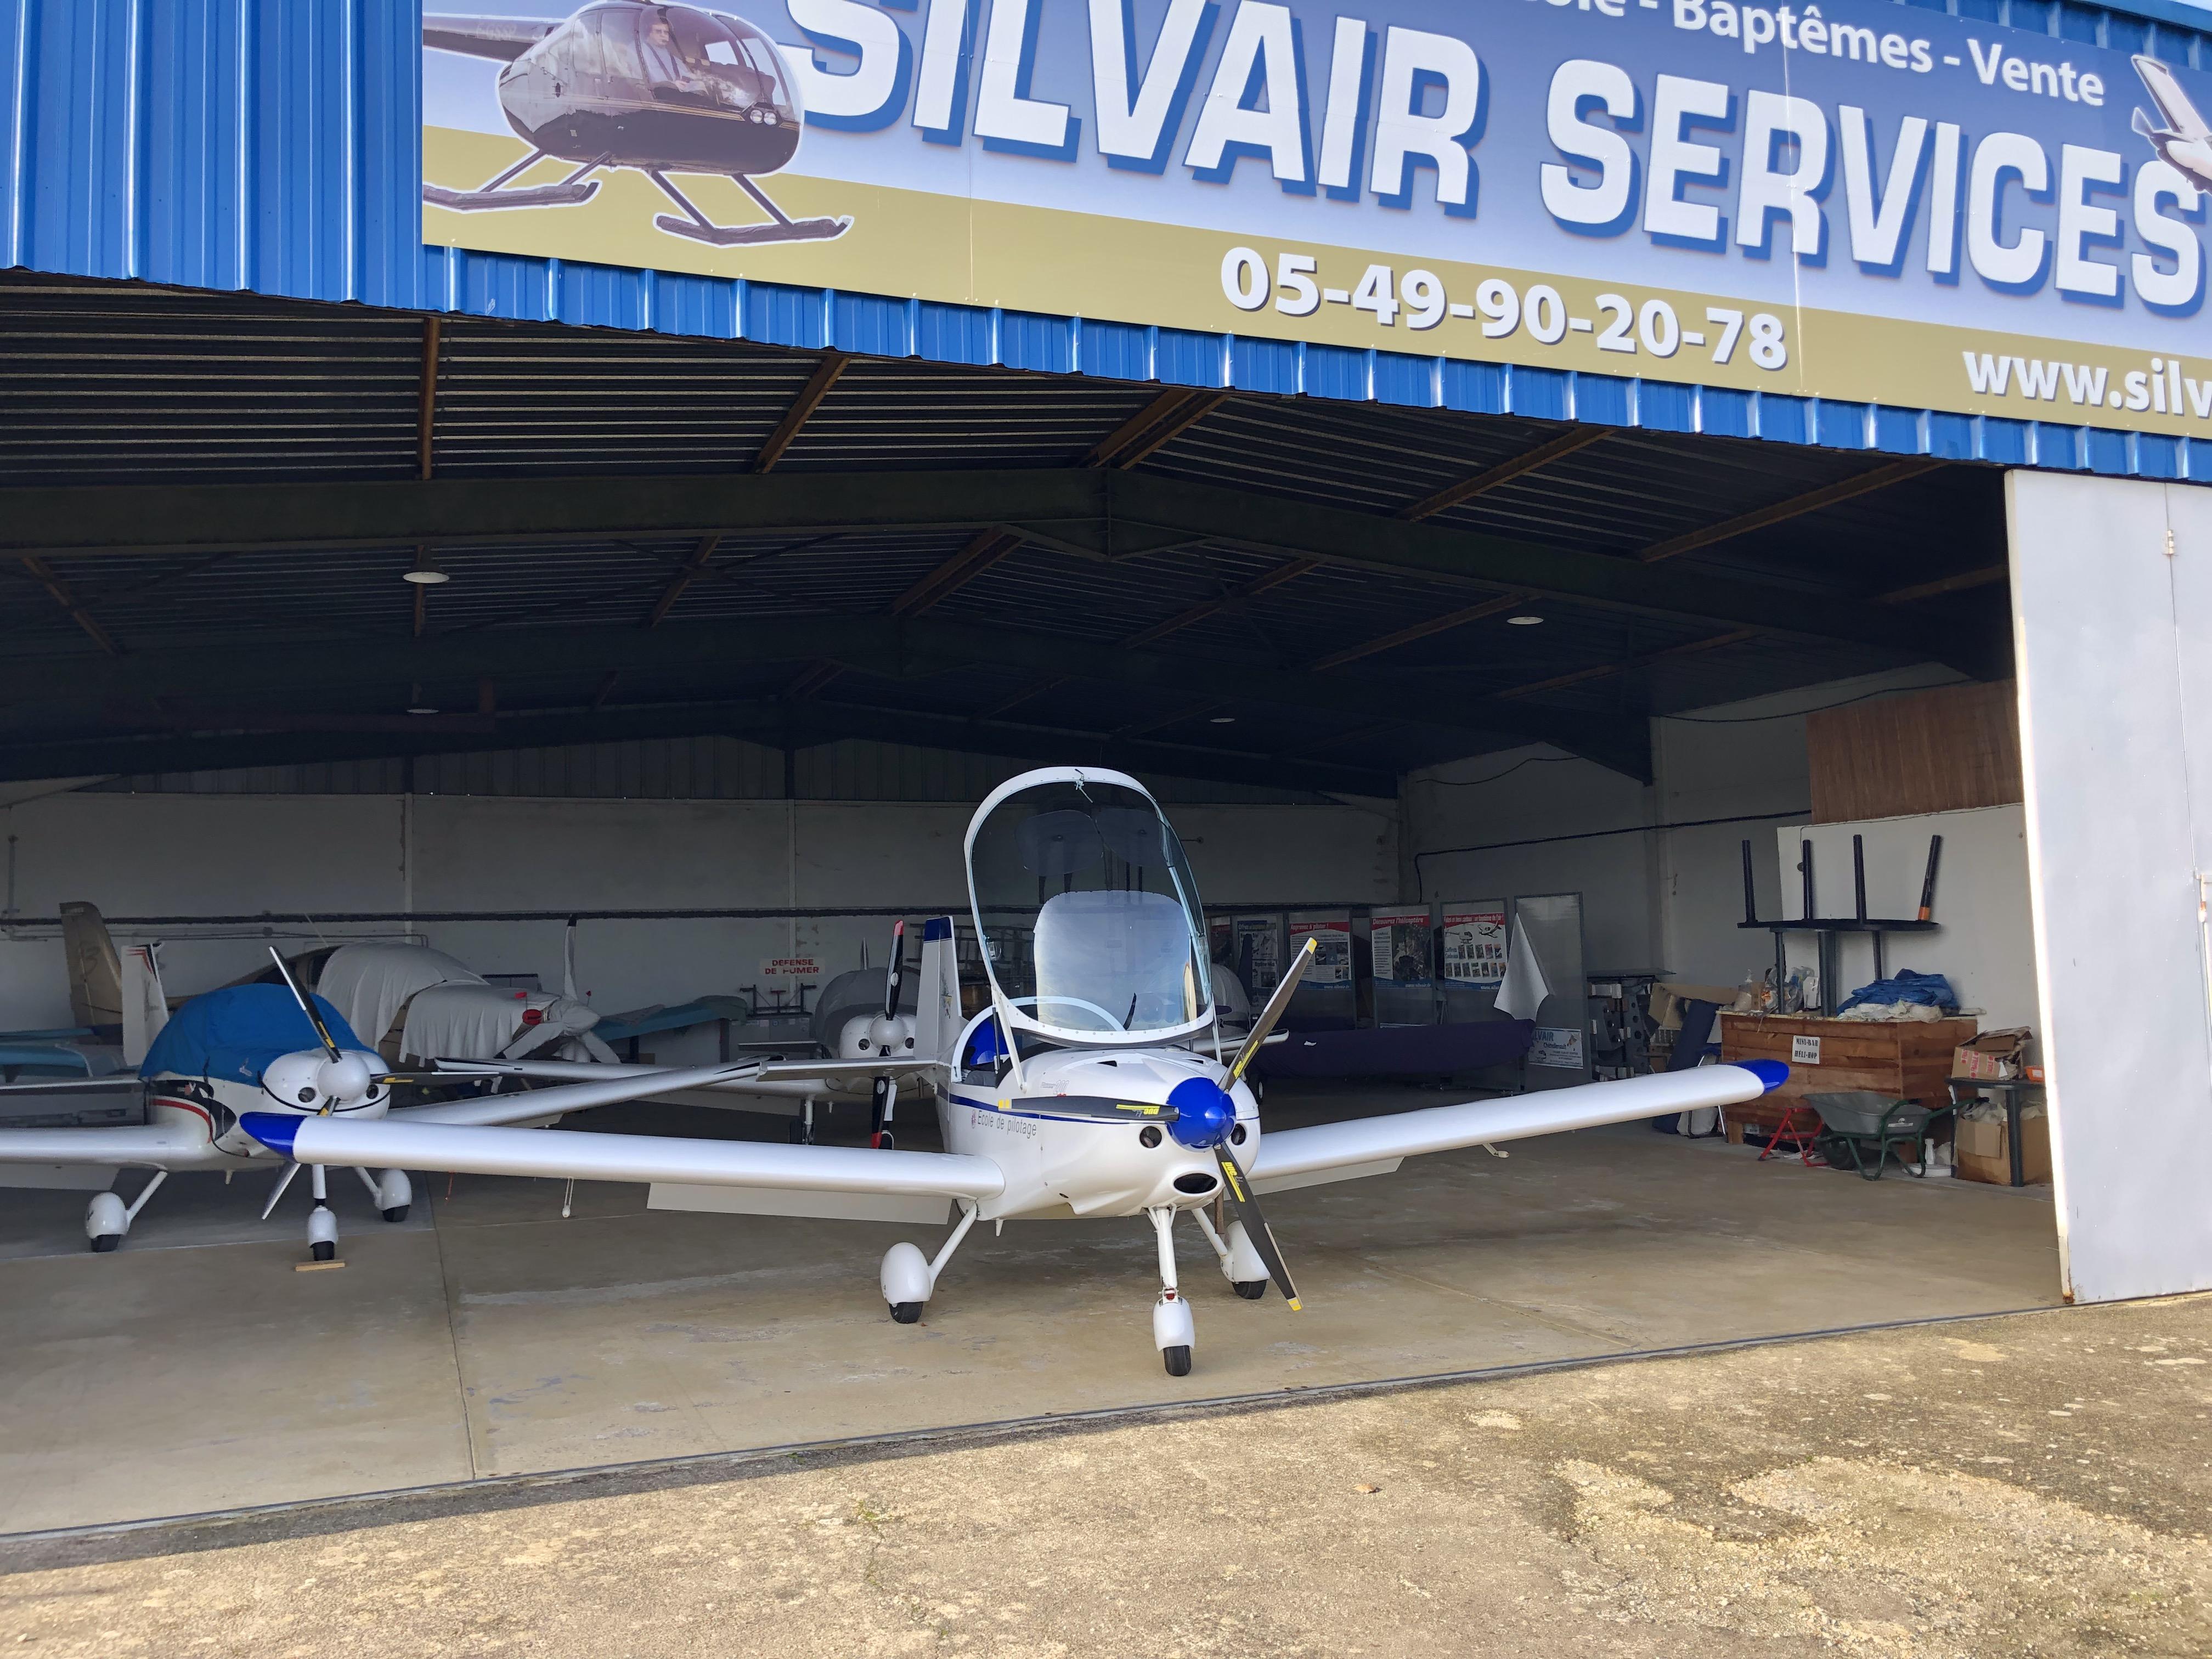 Silvair Services